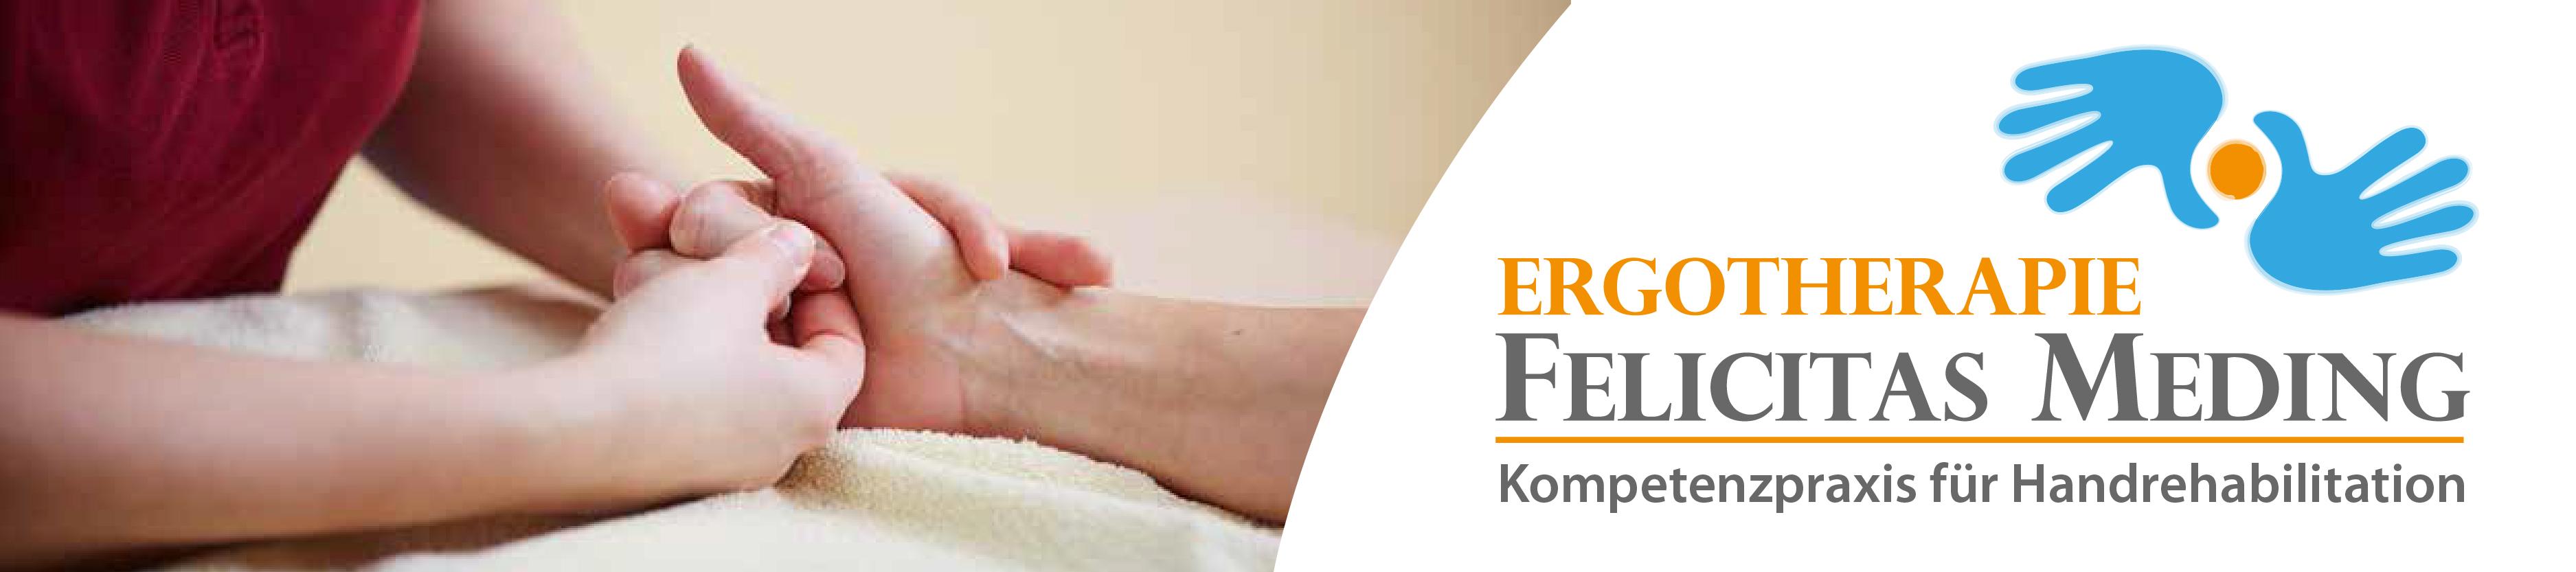 Ergotherapie Felicitas Meding